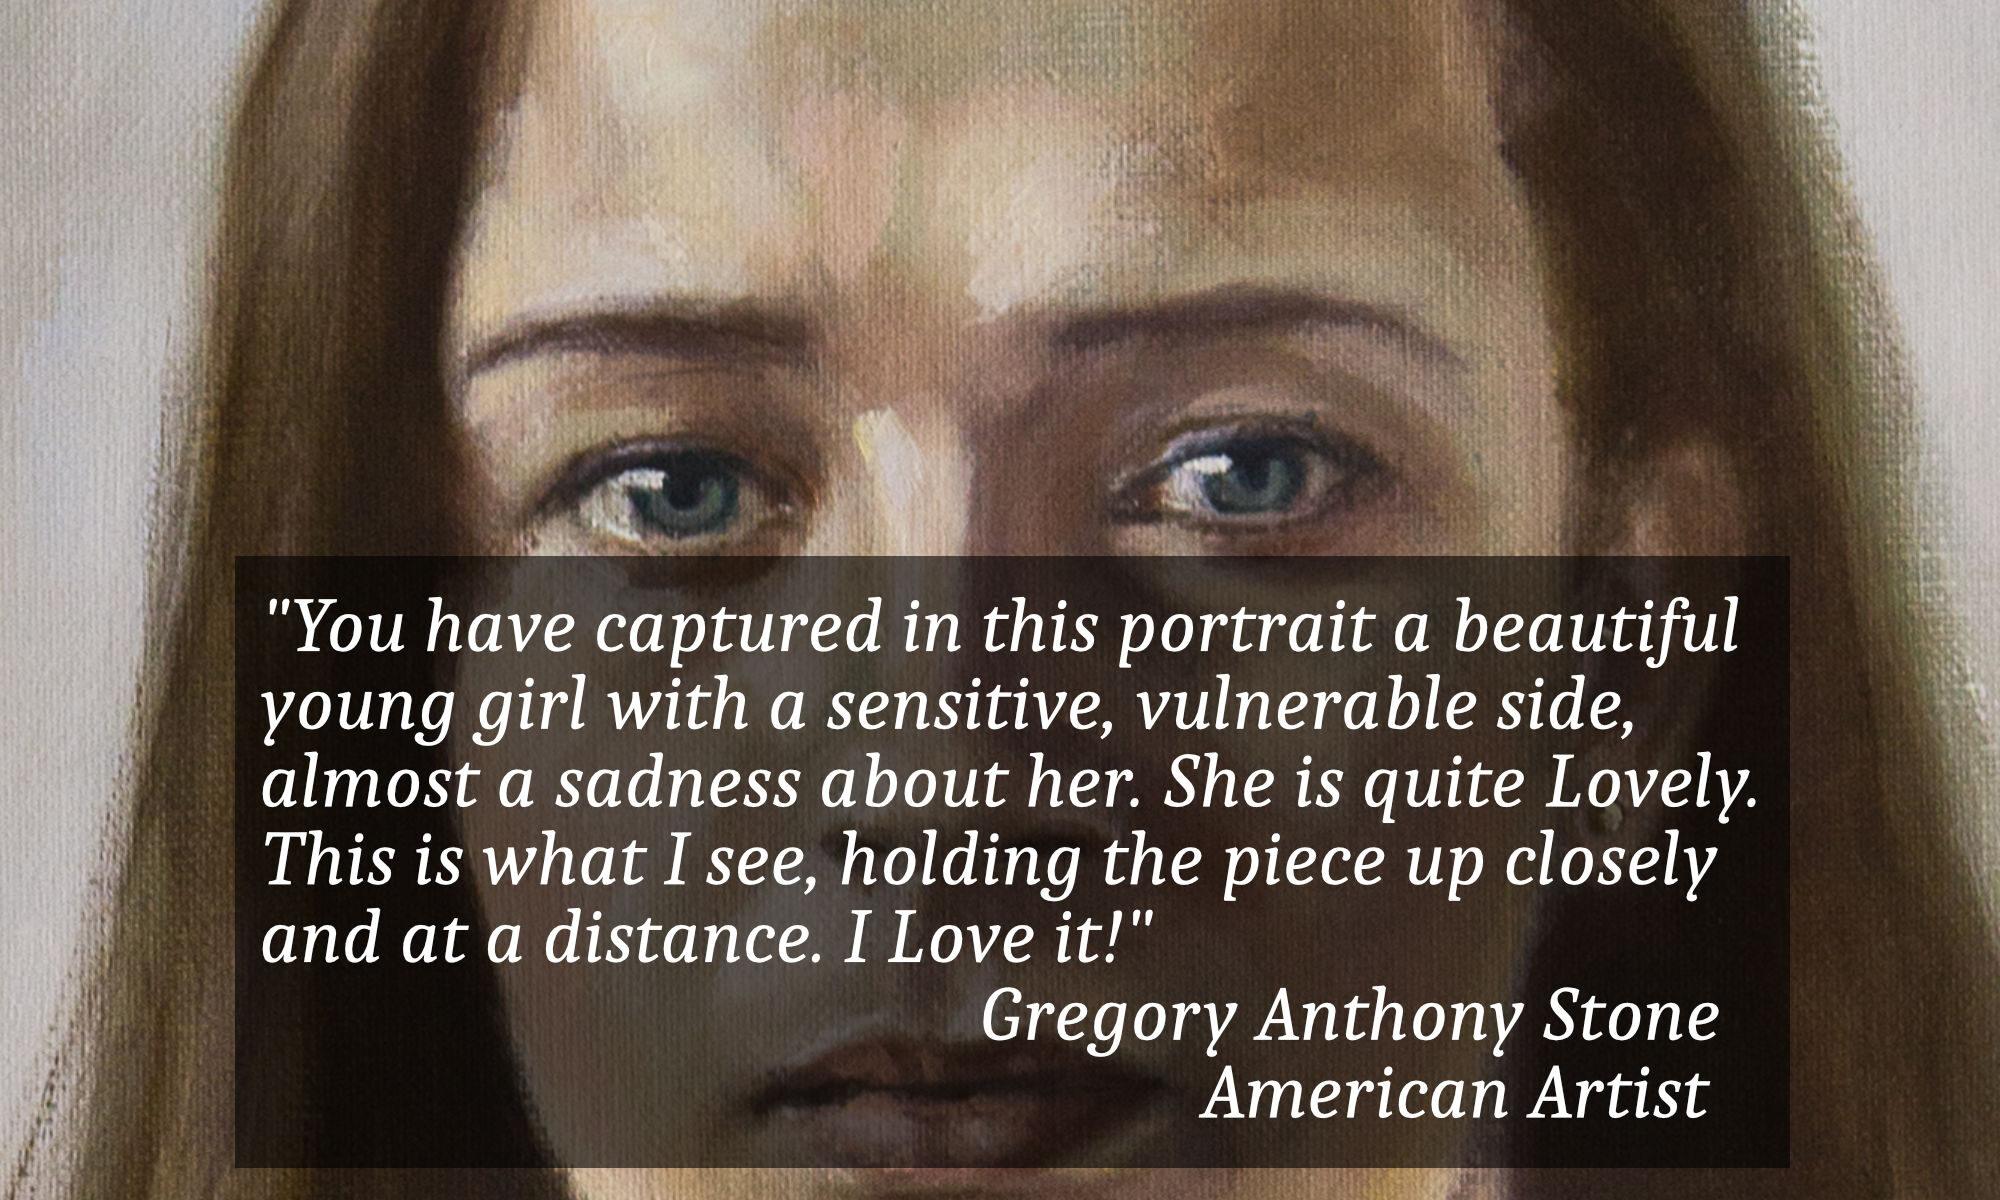 artist testimonial